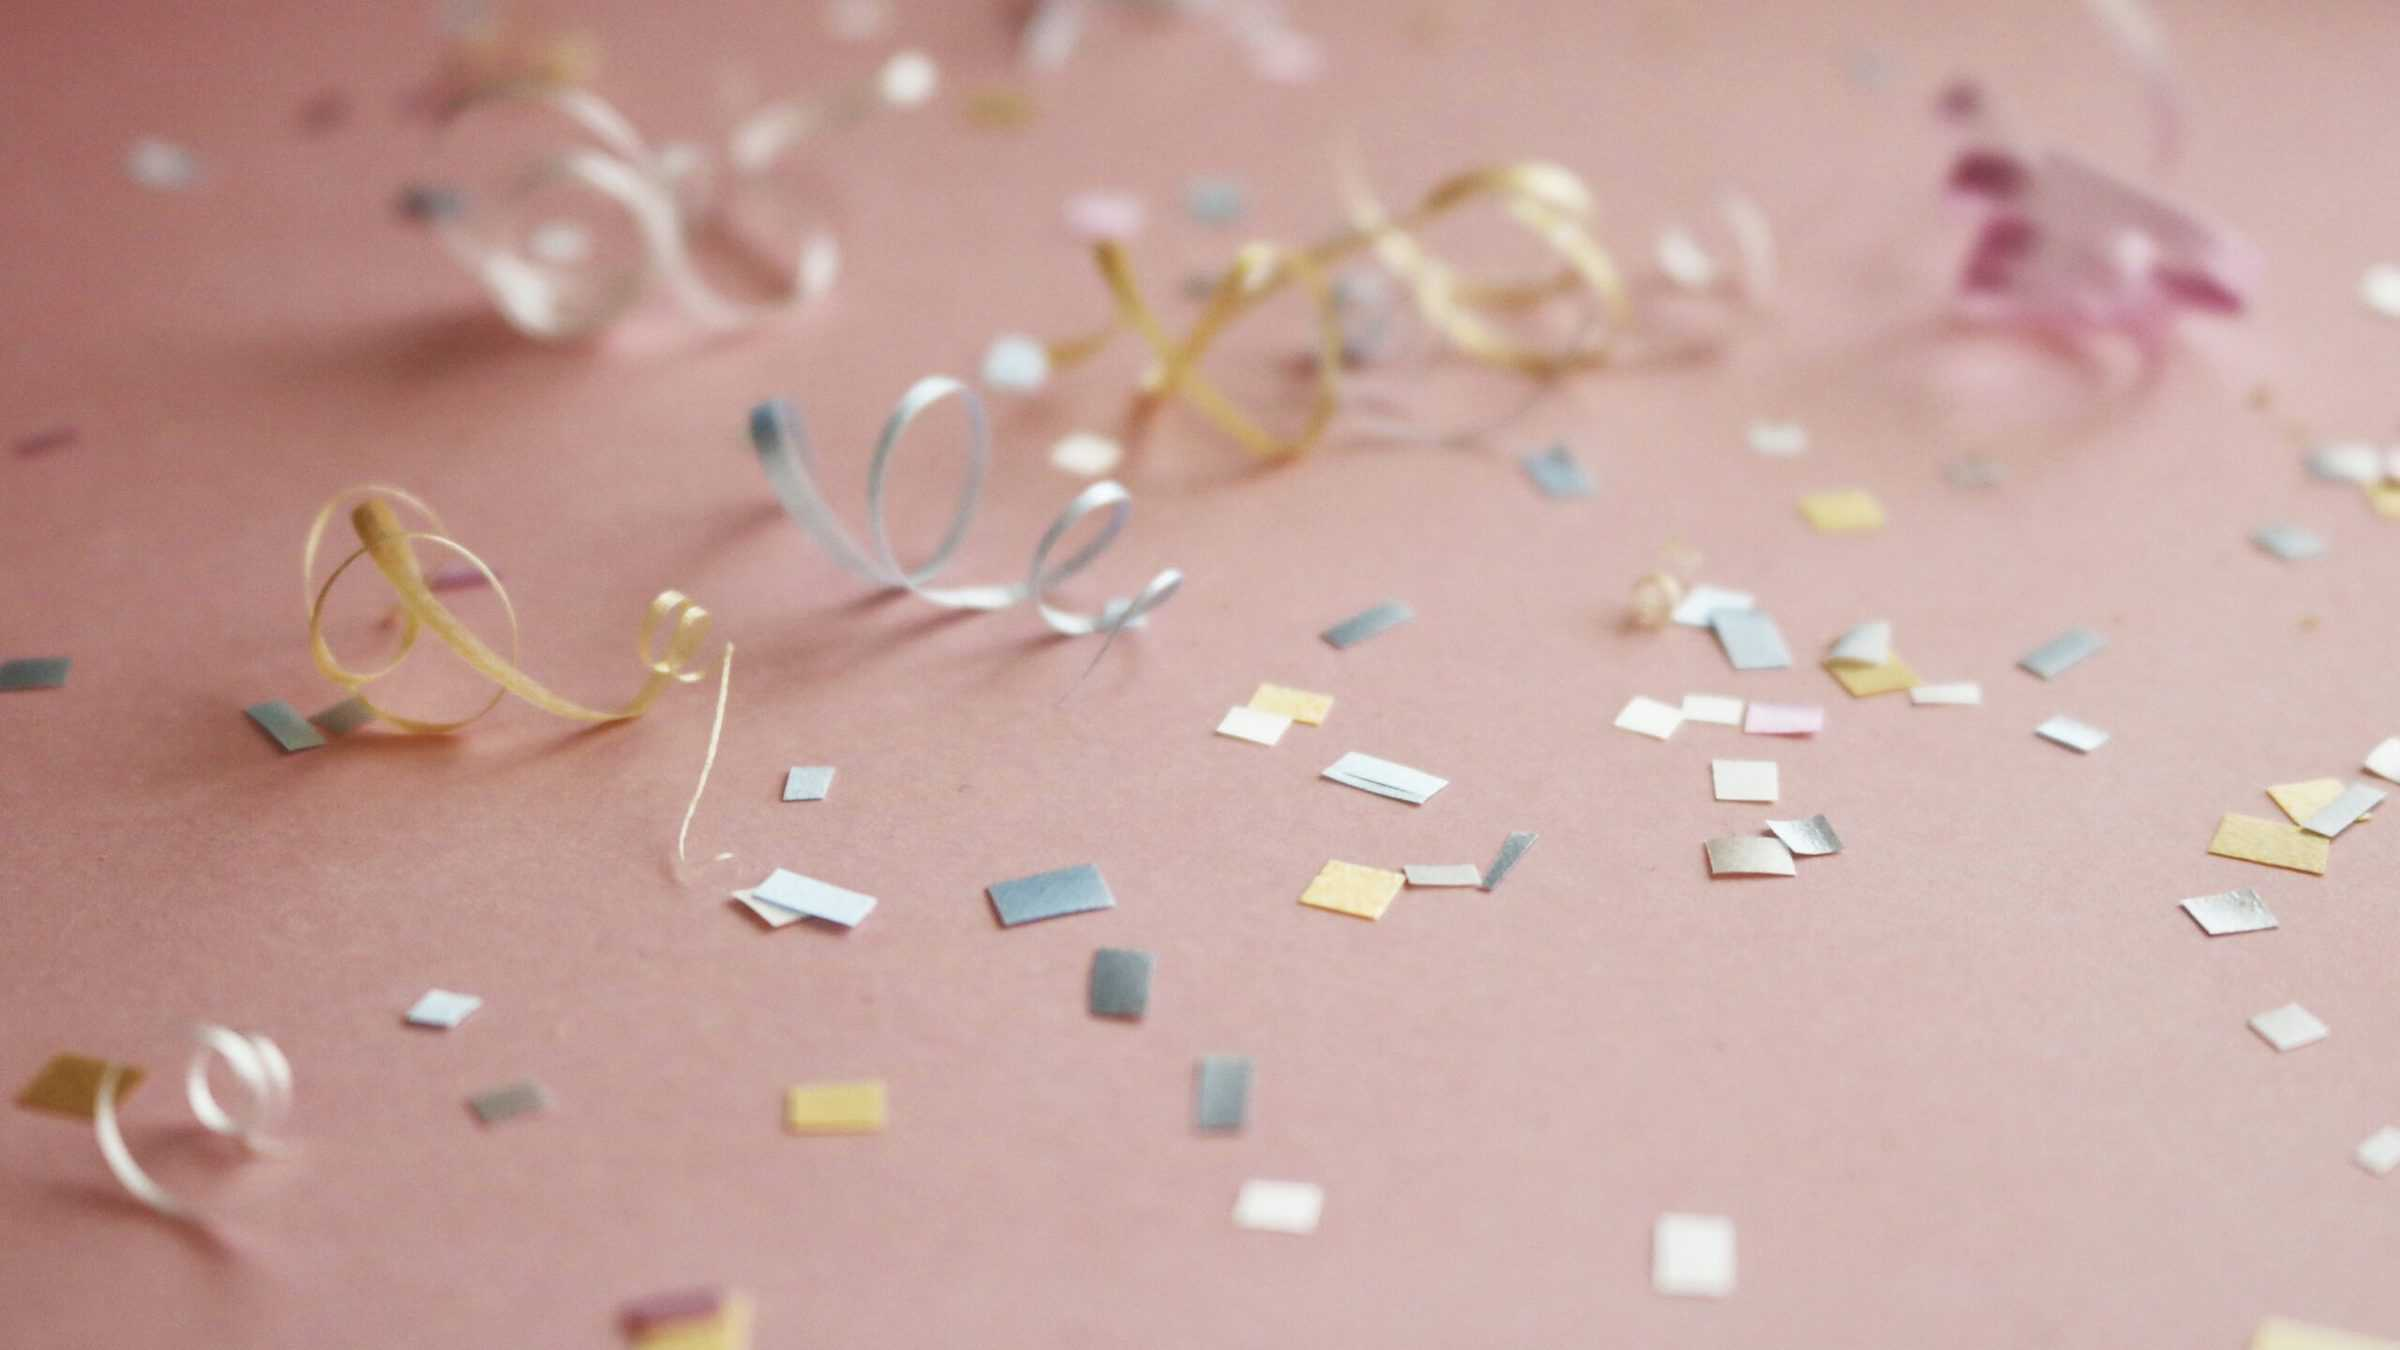 Festival - package - effectgroep - feest - online event - virtual event - community - confetti